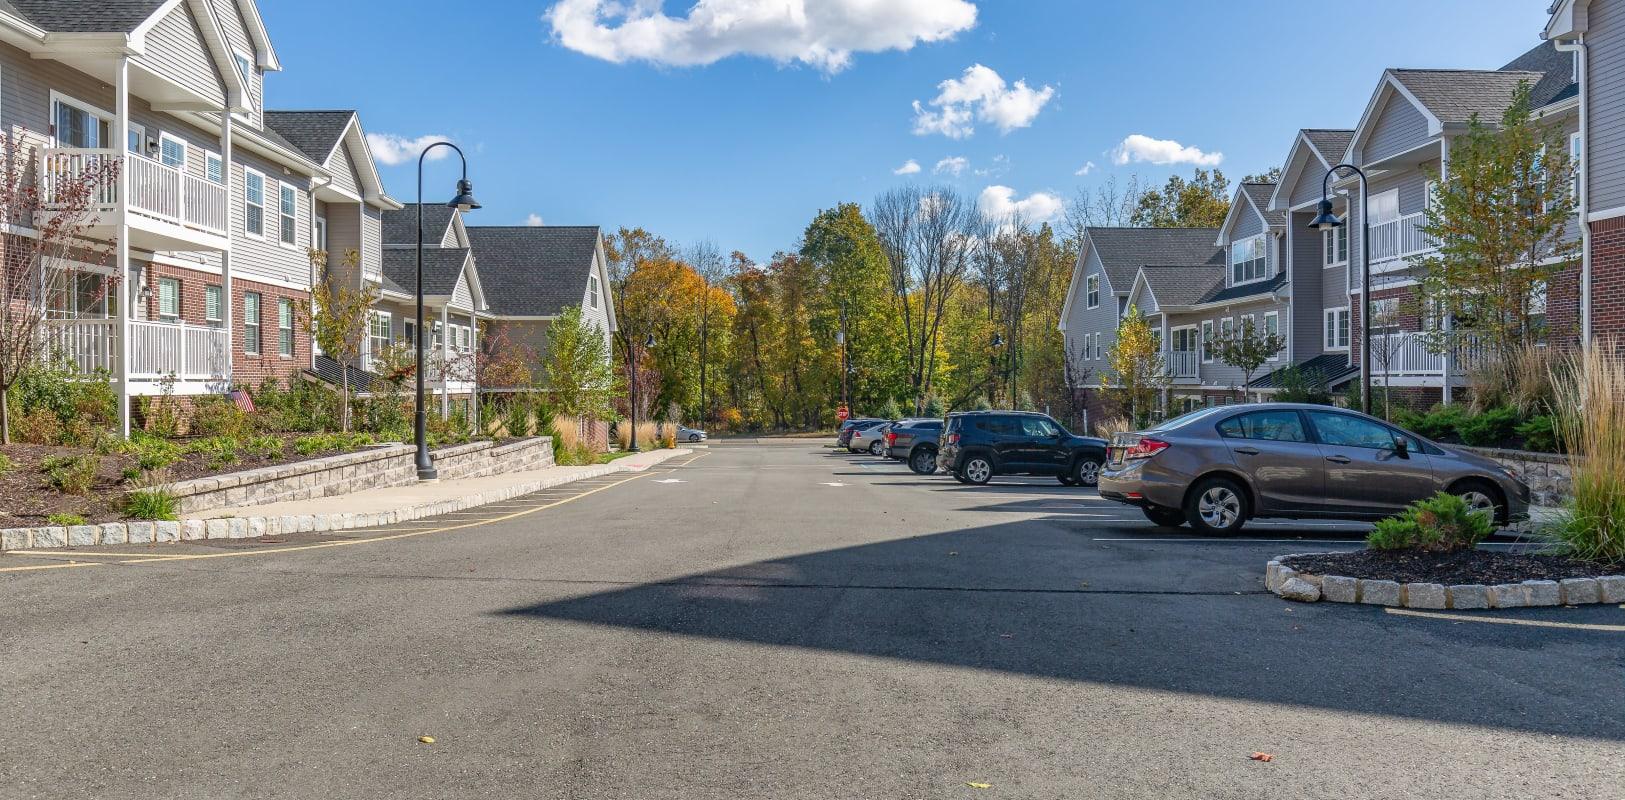 Exterior parking and street at Zephyr Ridge in Cedar Grove, New Jersey